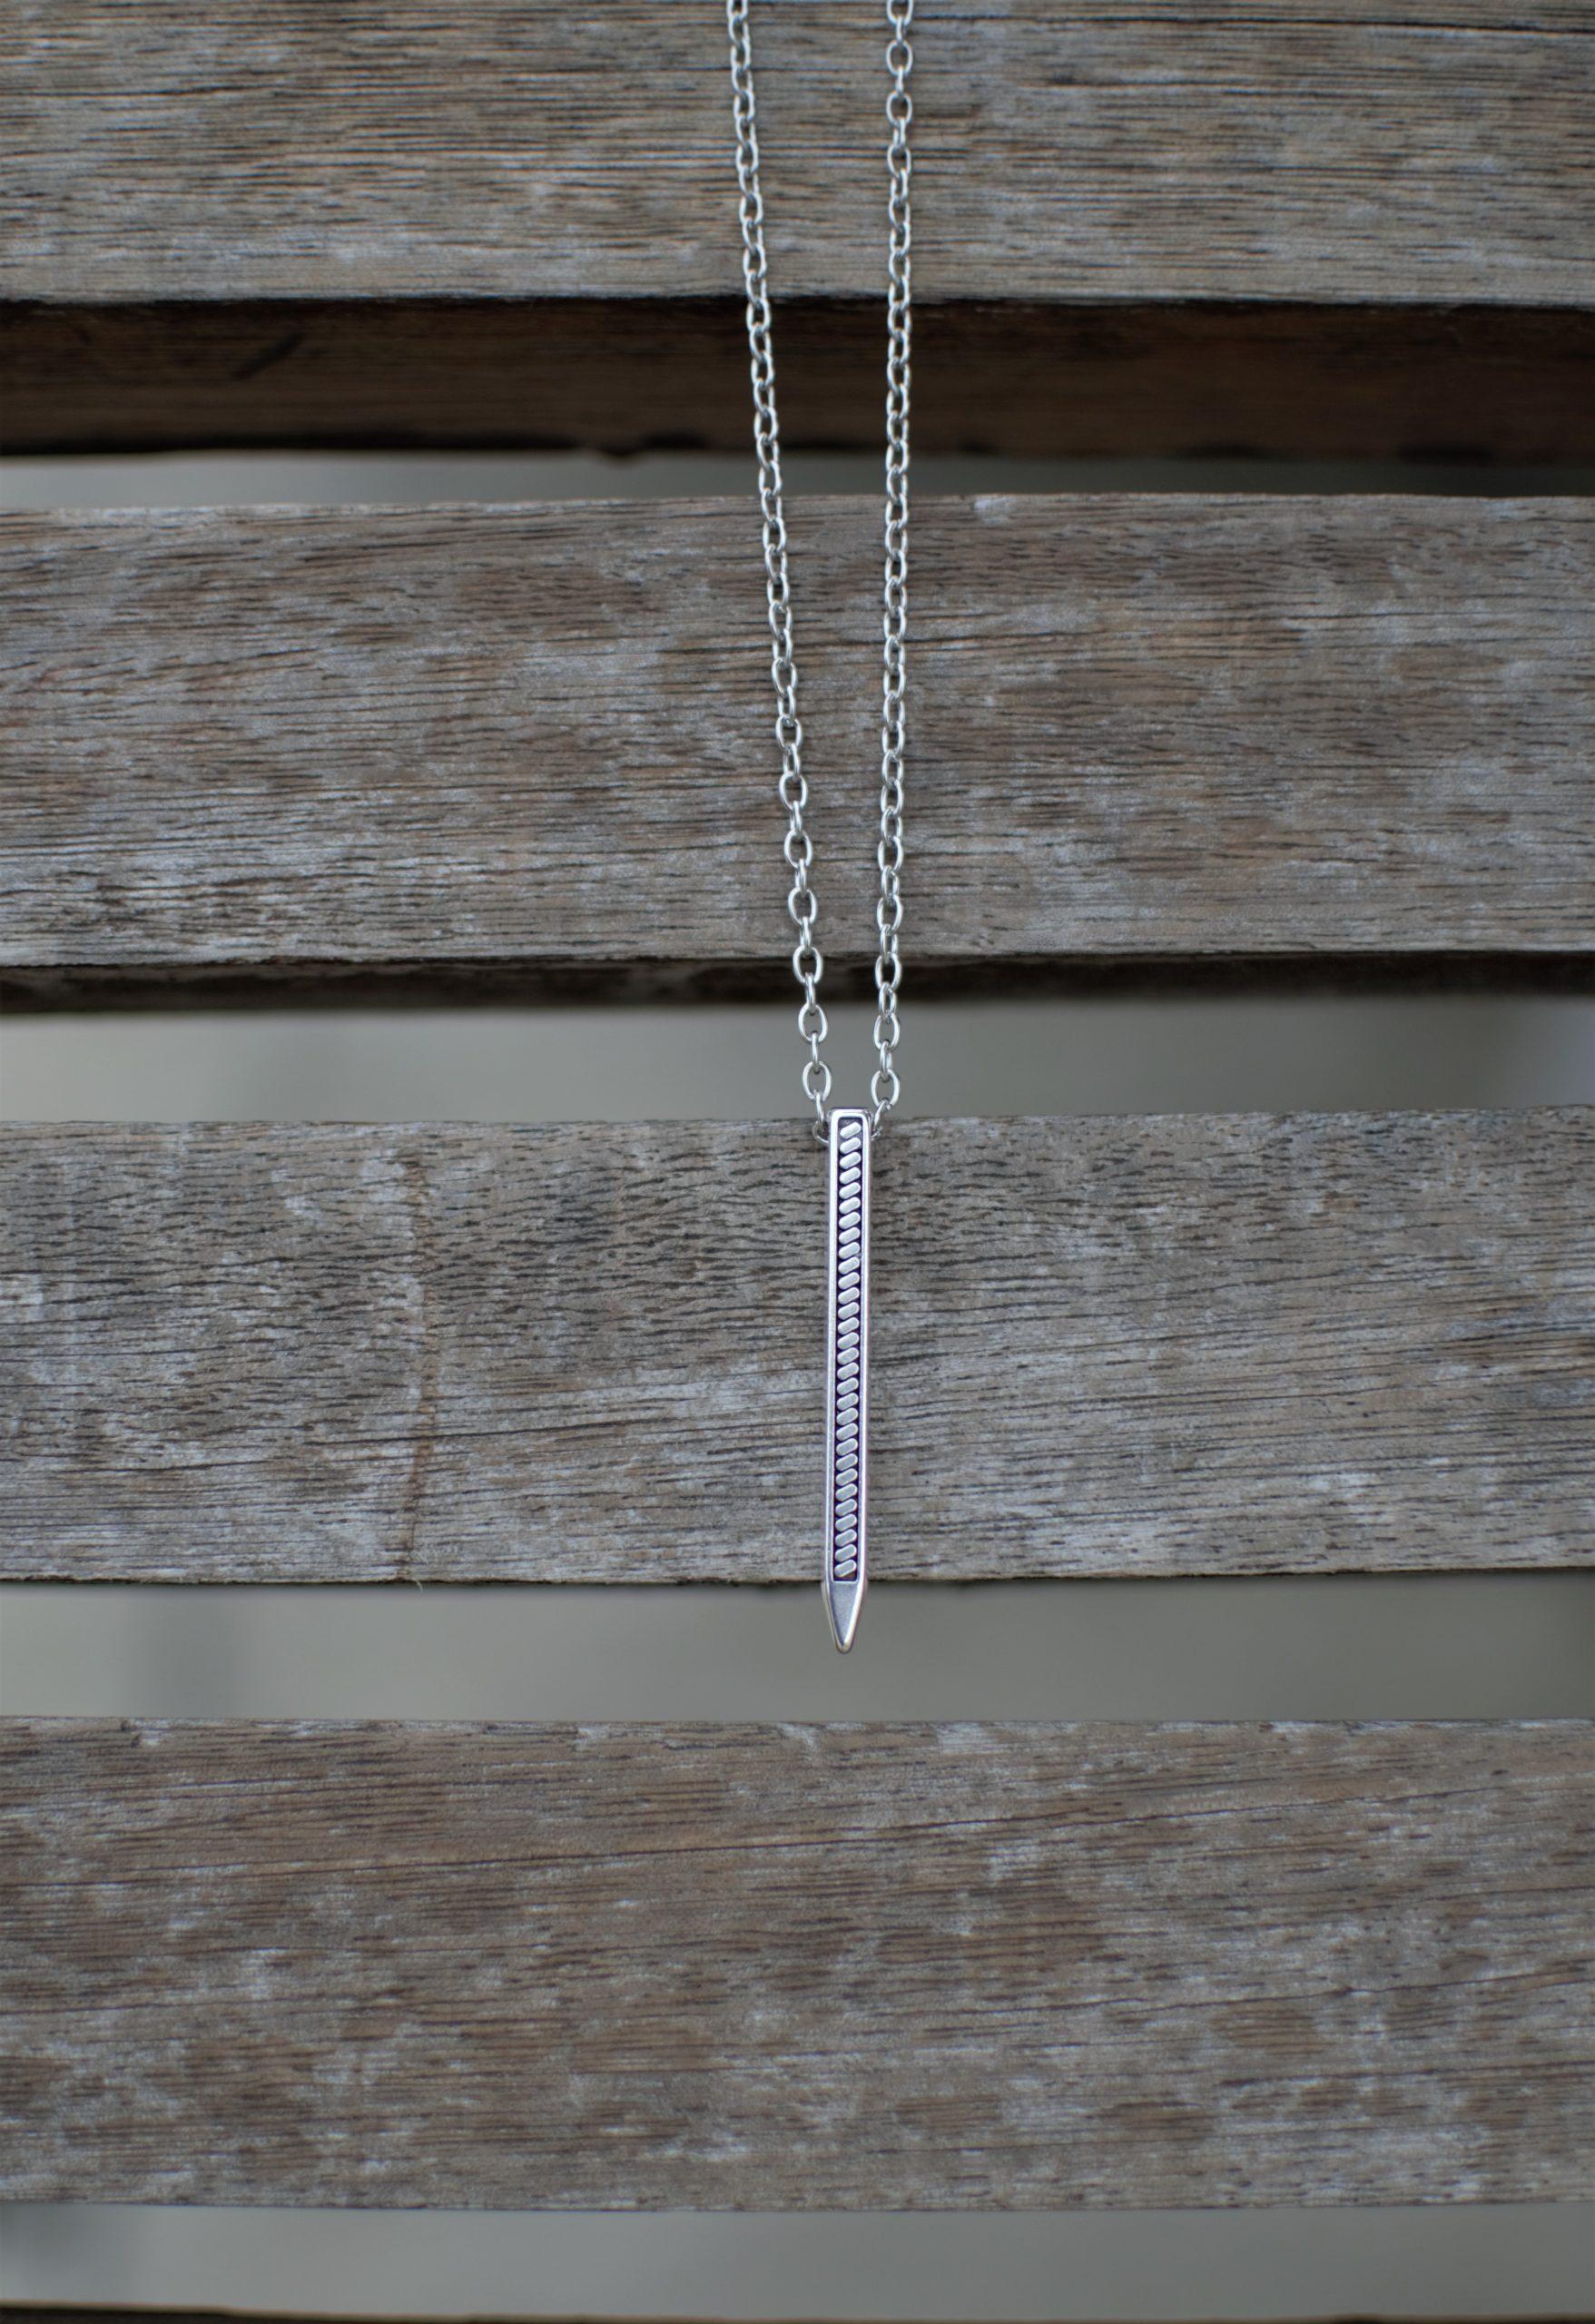 The Chain Line Men's Necklace